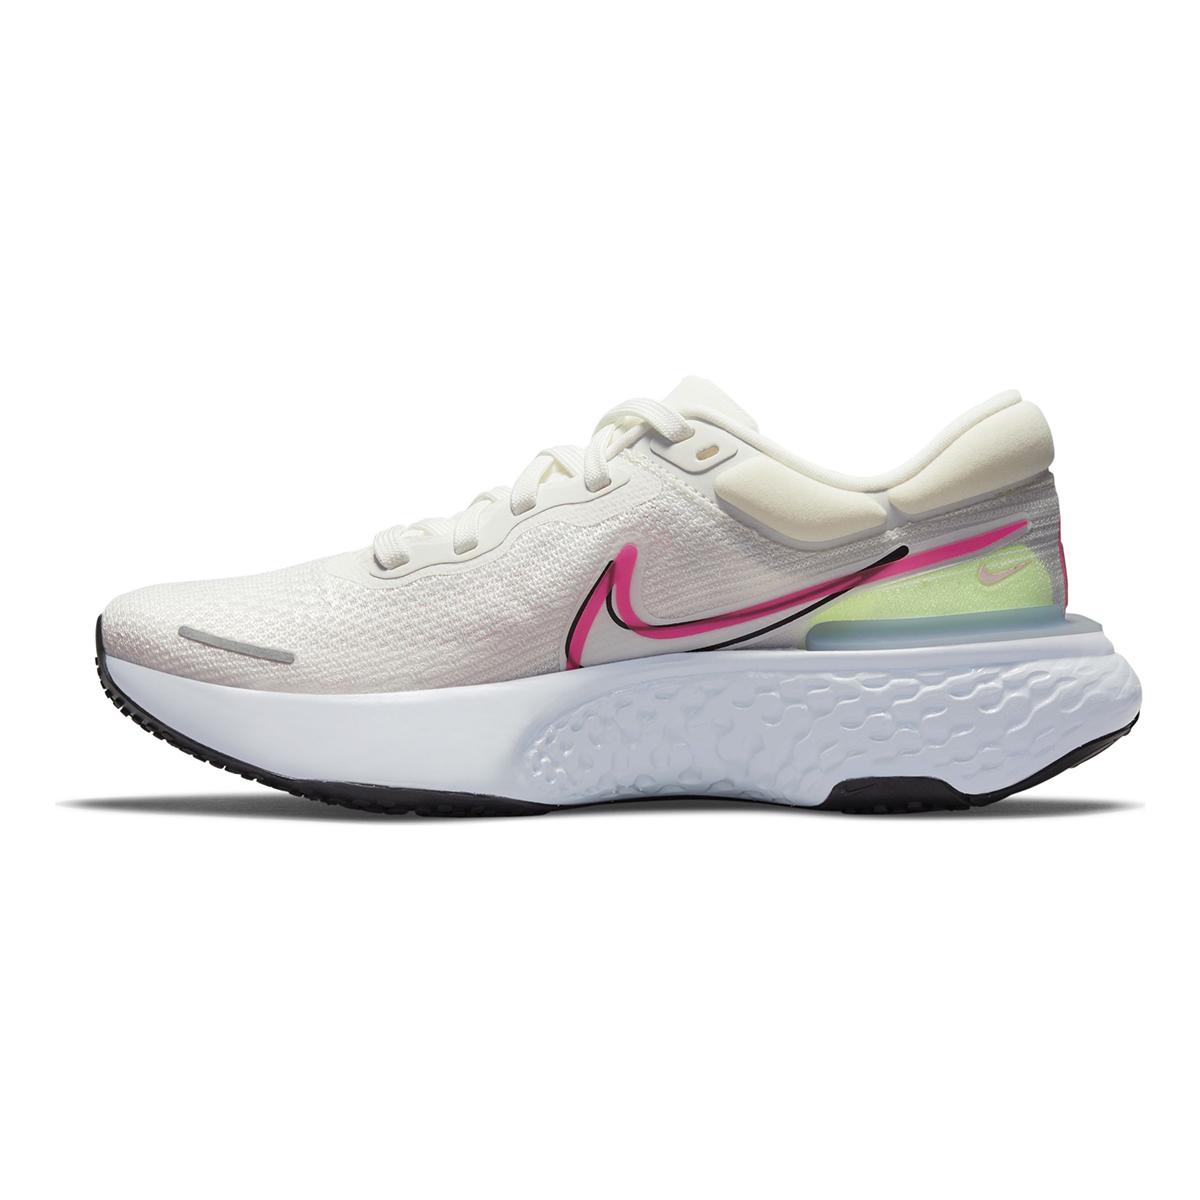 Men's Nike ZoomX Invincible Run Flyknit Running Shoe - Color: Rawdacious - Size: 6 - Width: Regular, Rawdacious, large, image 2